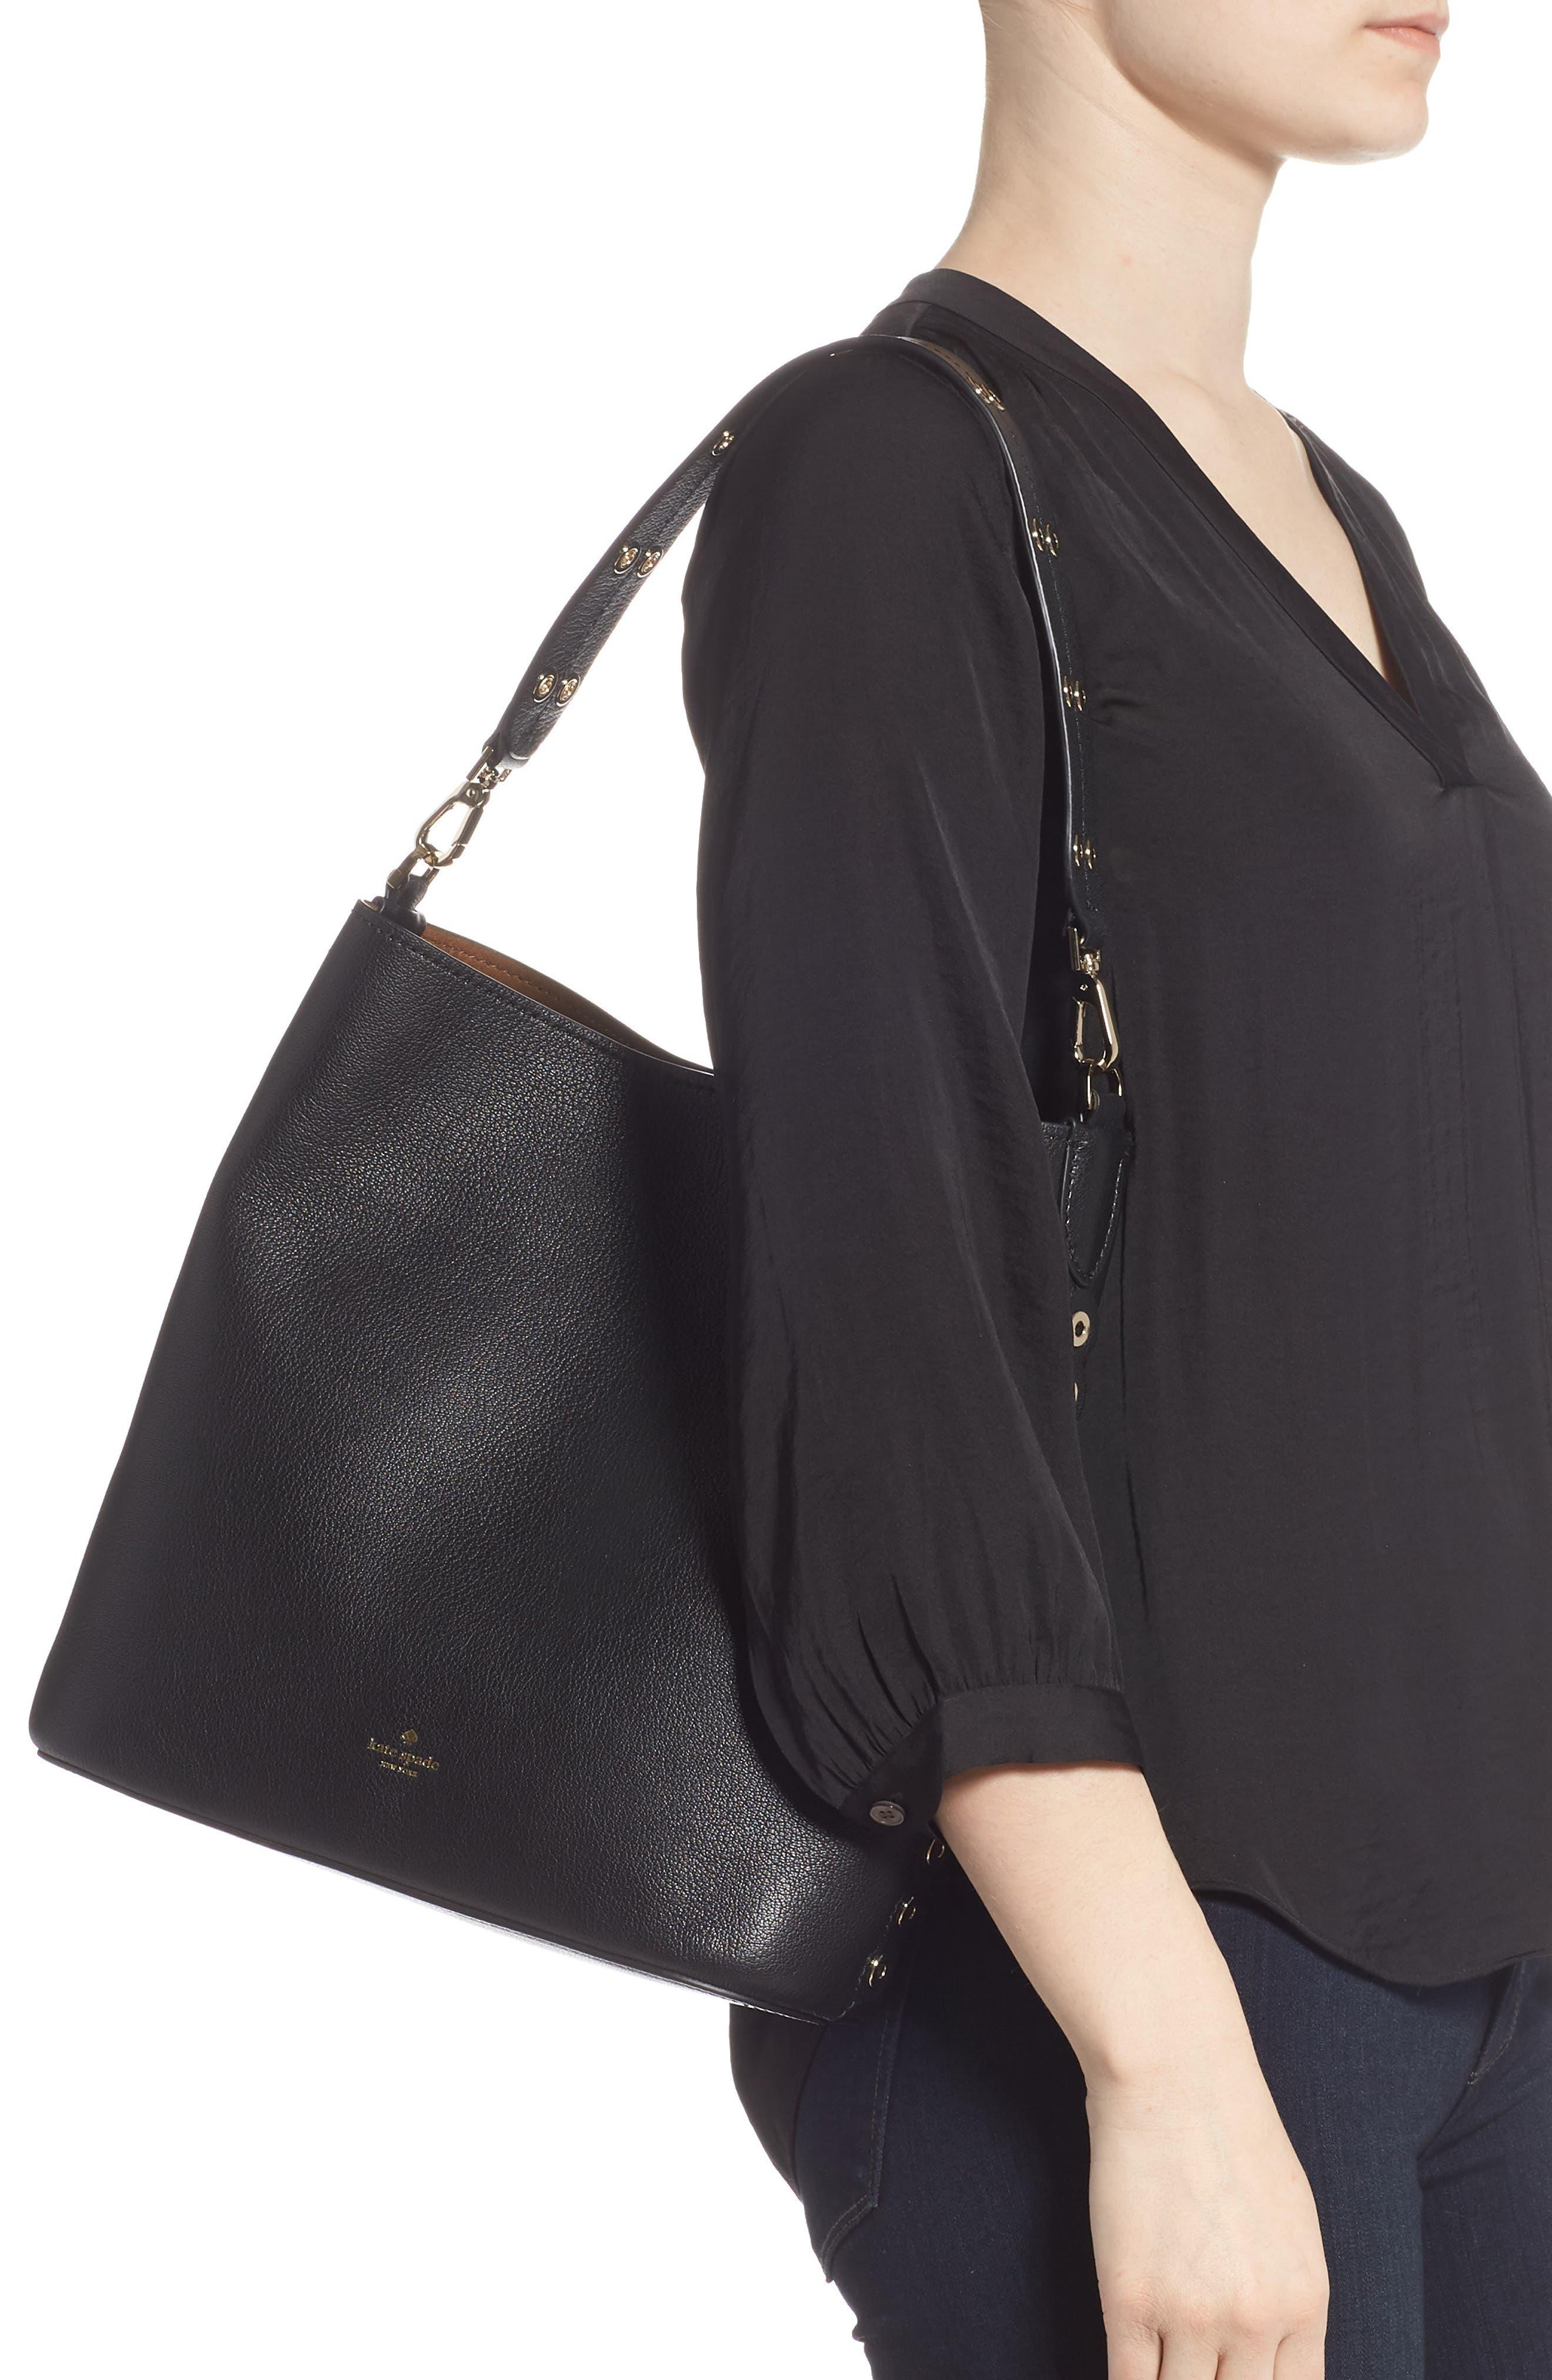 atlantic avenue libby grommet leather tote,                             Alternate thumbnail 2, color,                             BLACK